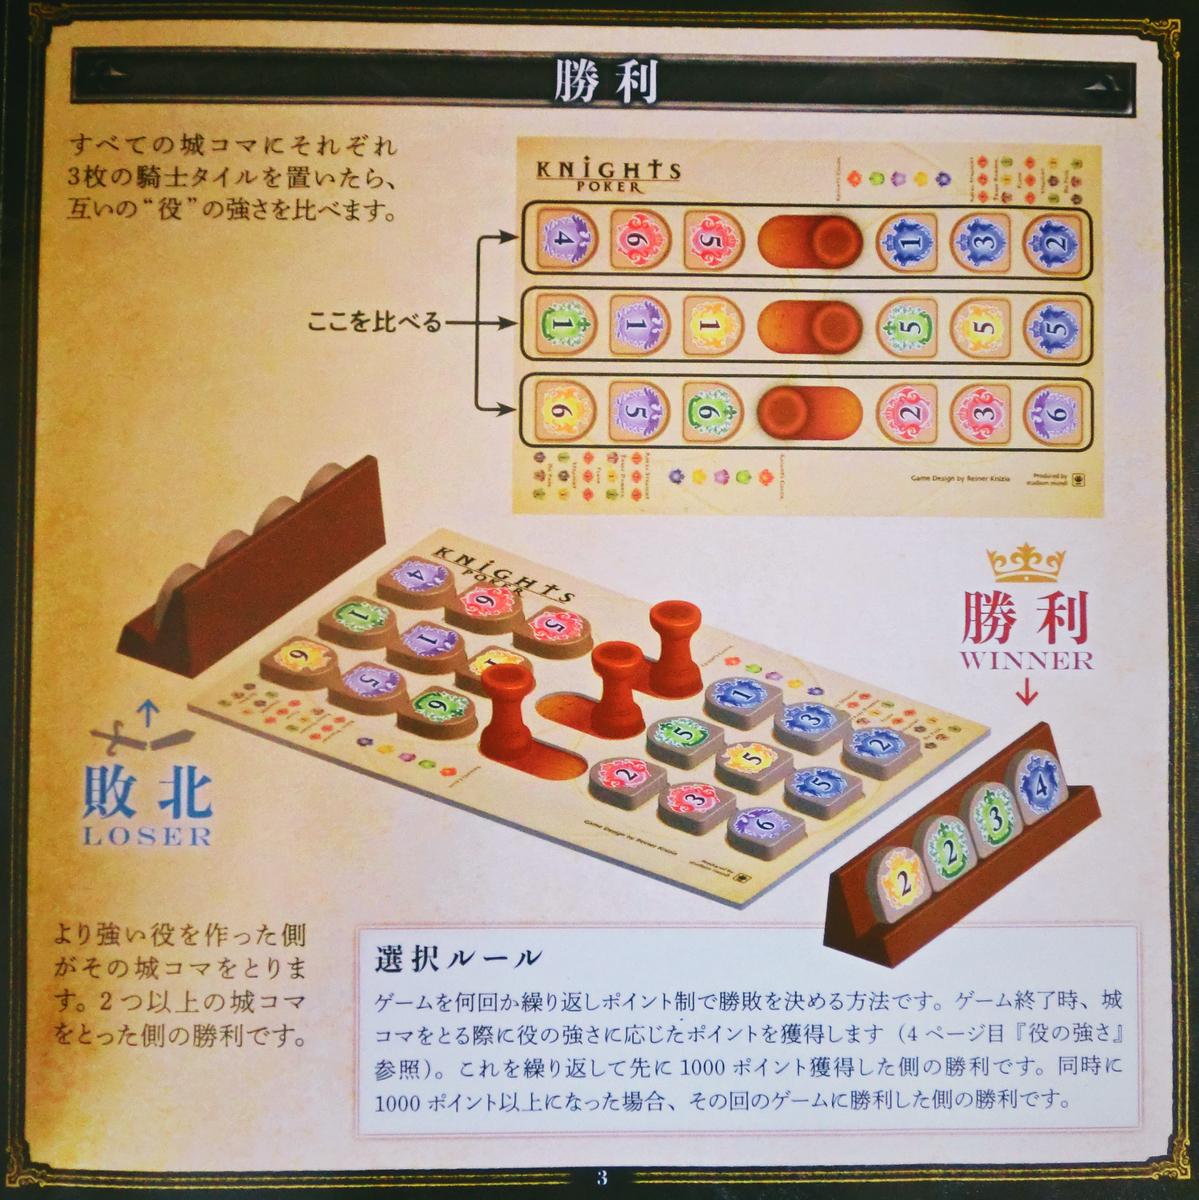 f:id:board_game_beauty:20200511135626j:plain